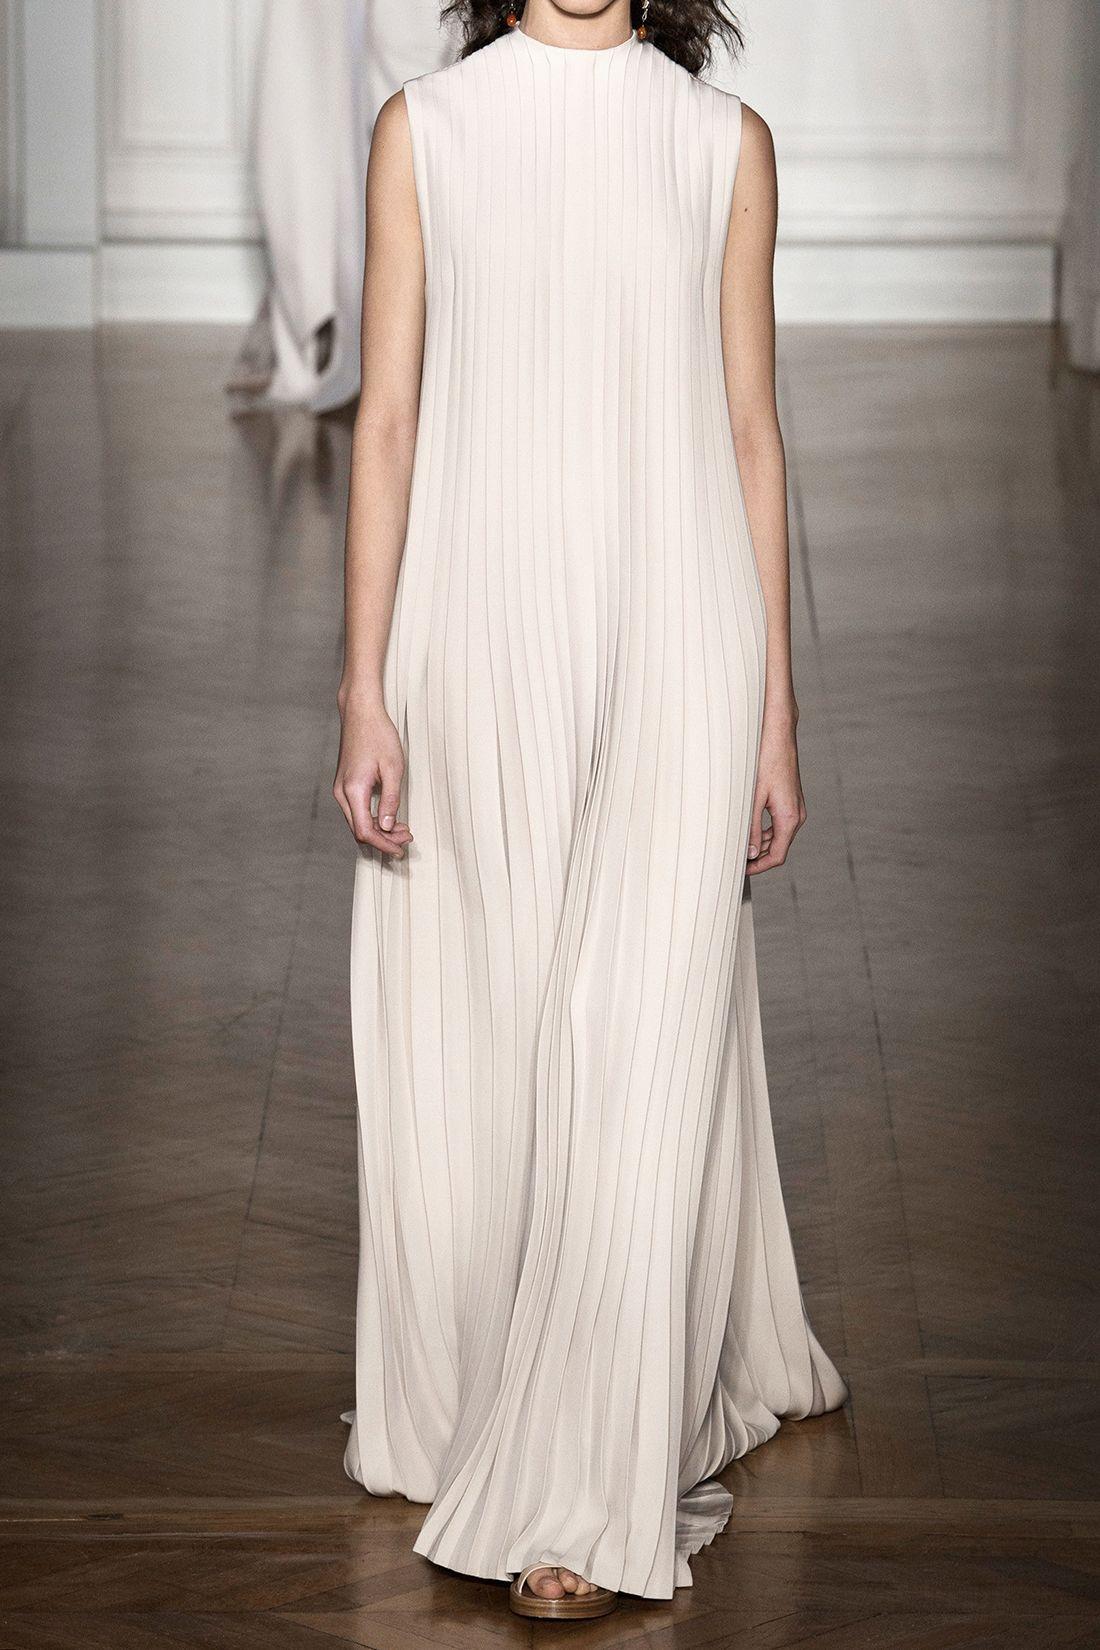 Valentino wedding dress  Great heck neck pleated Valentino gown weddingdress  Wedding